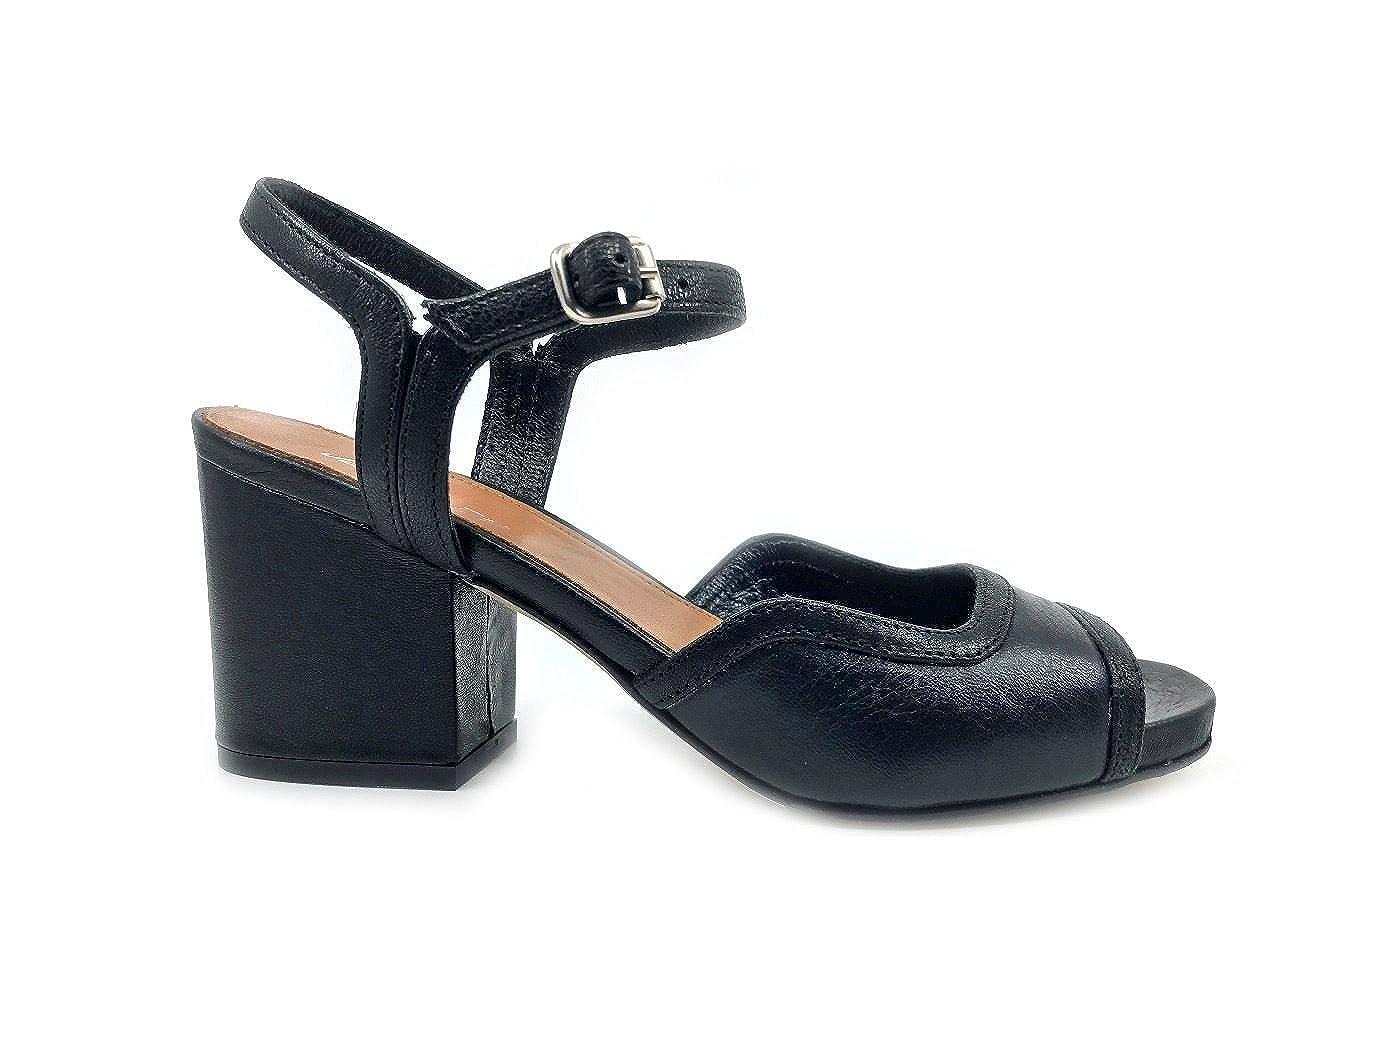 Para Zapatos Julie Dee Sandalias Vestir Mujer De Goma UpVSzM